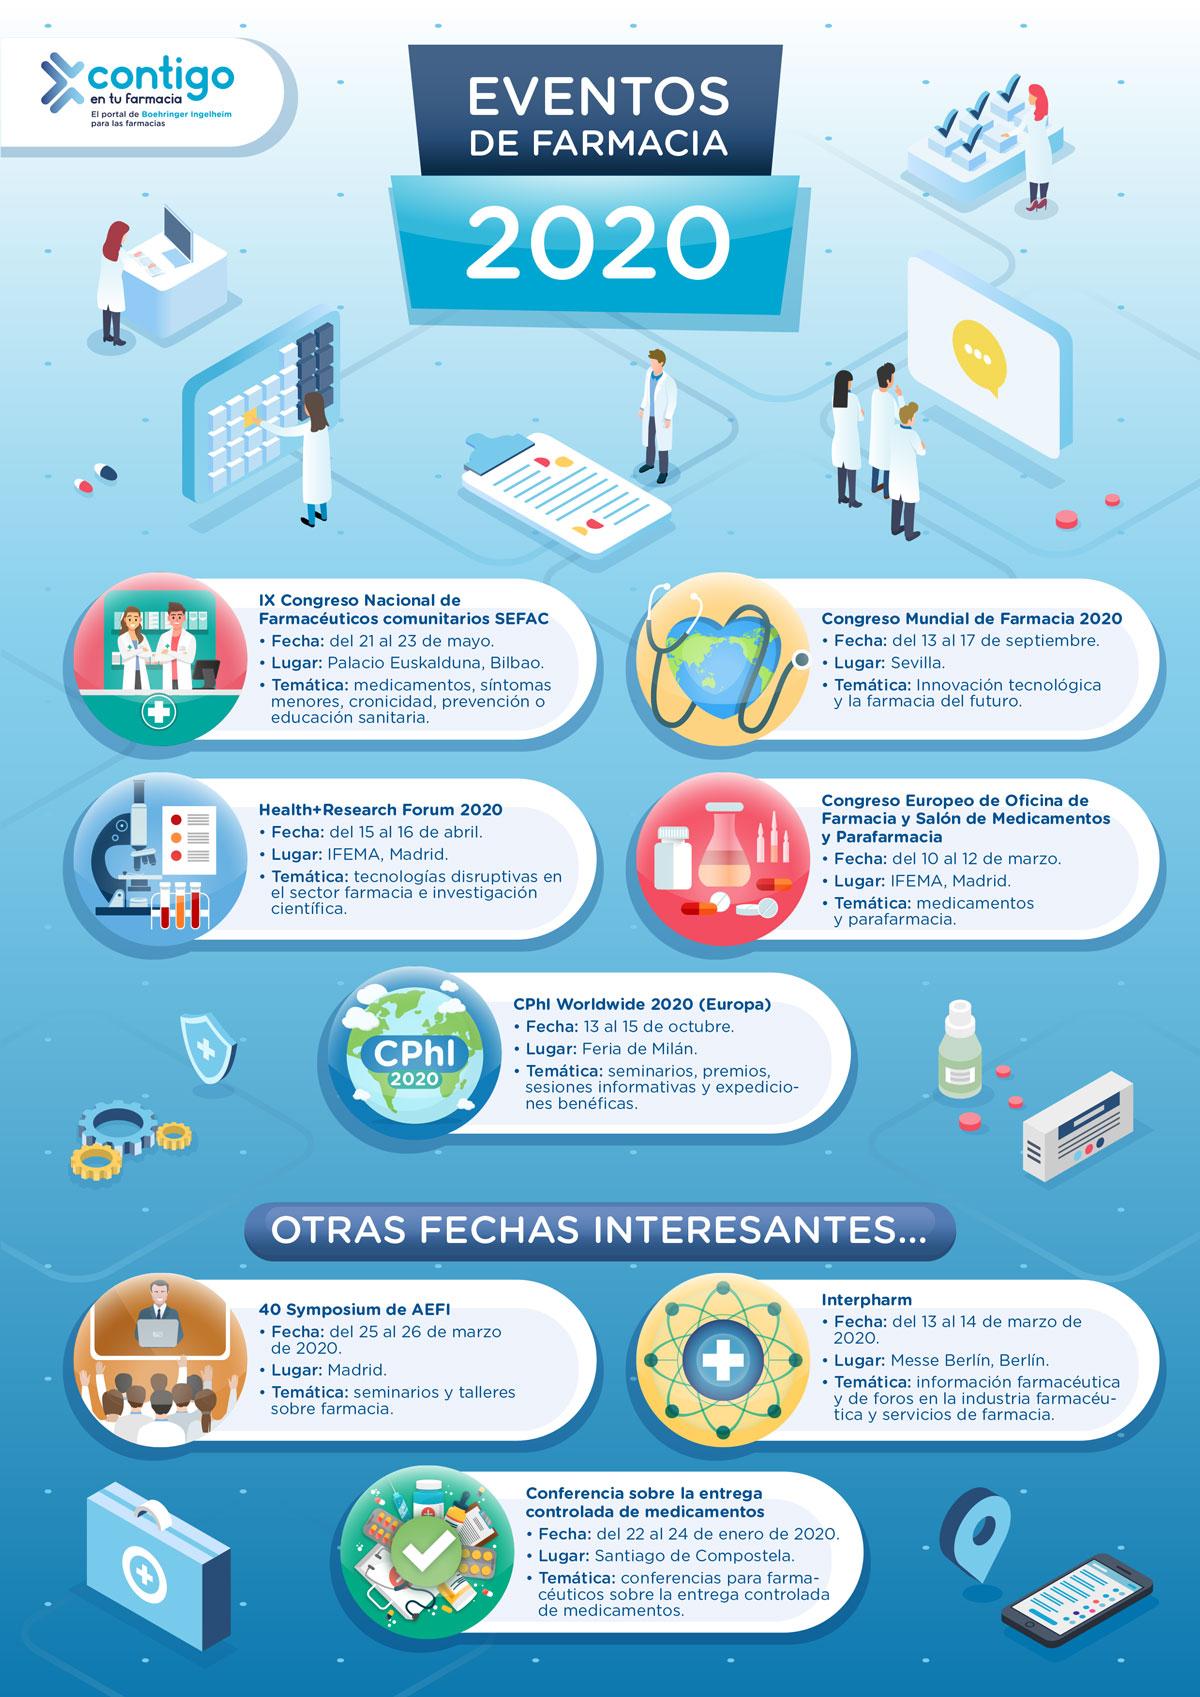 Eventos farmaceuticos 2020